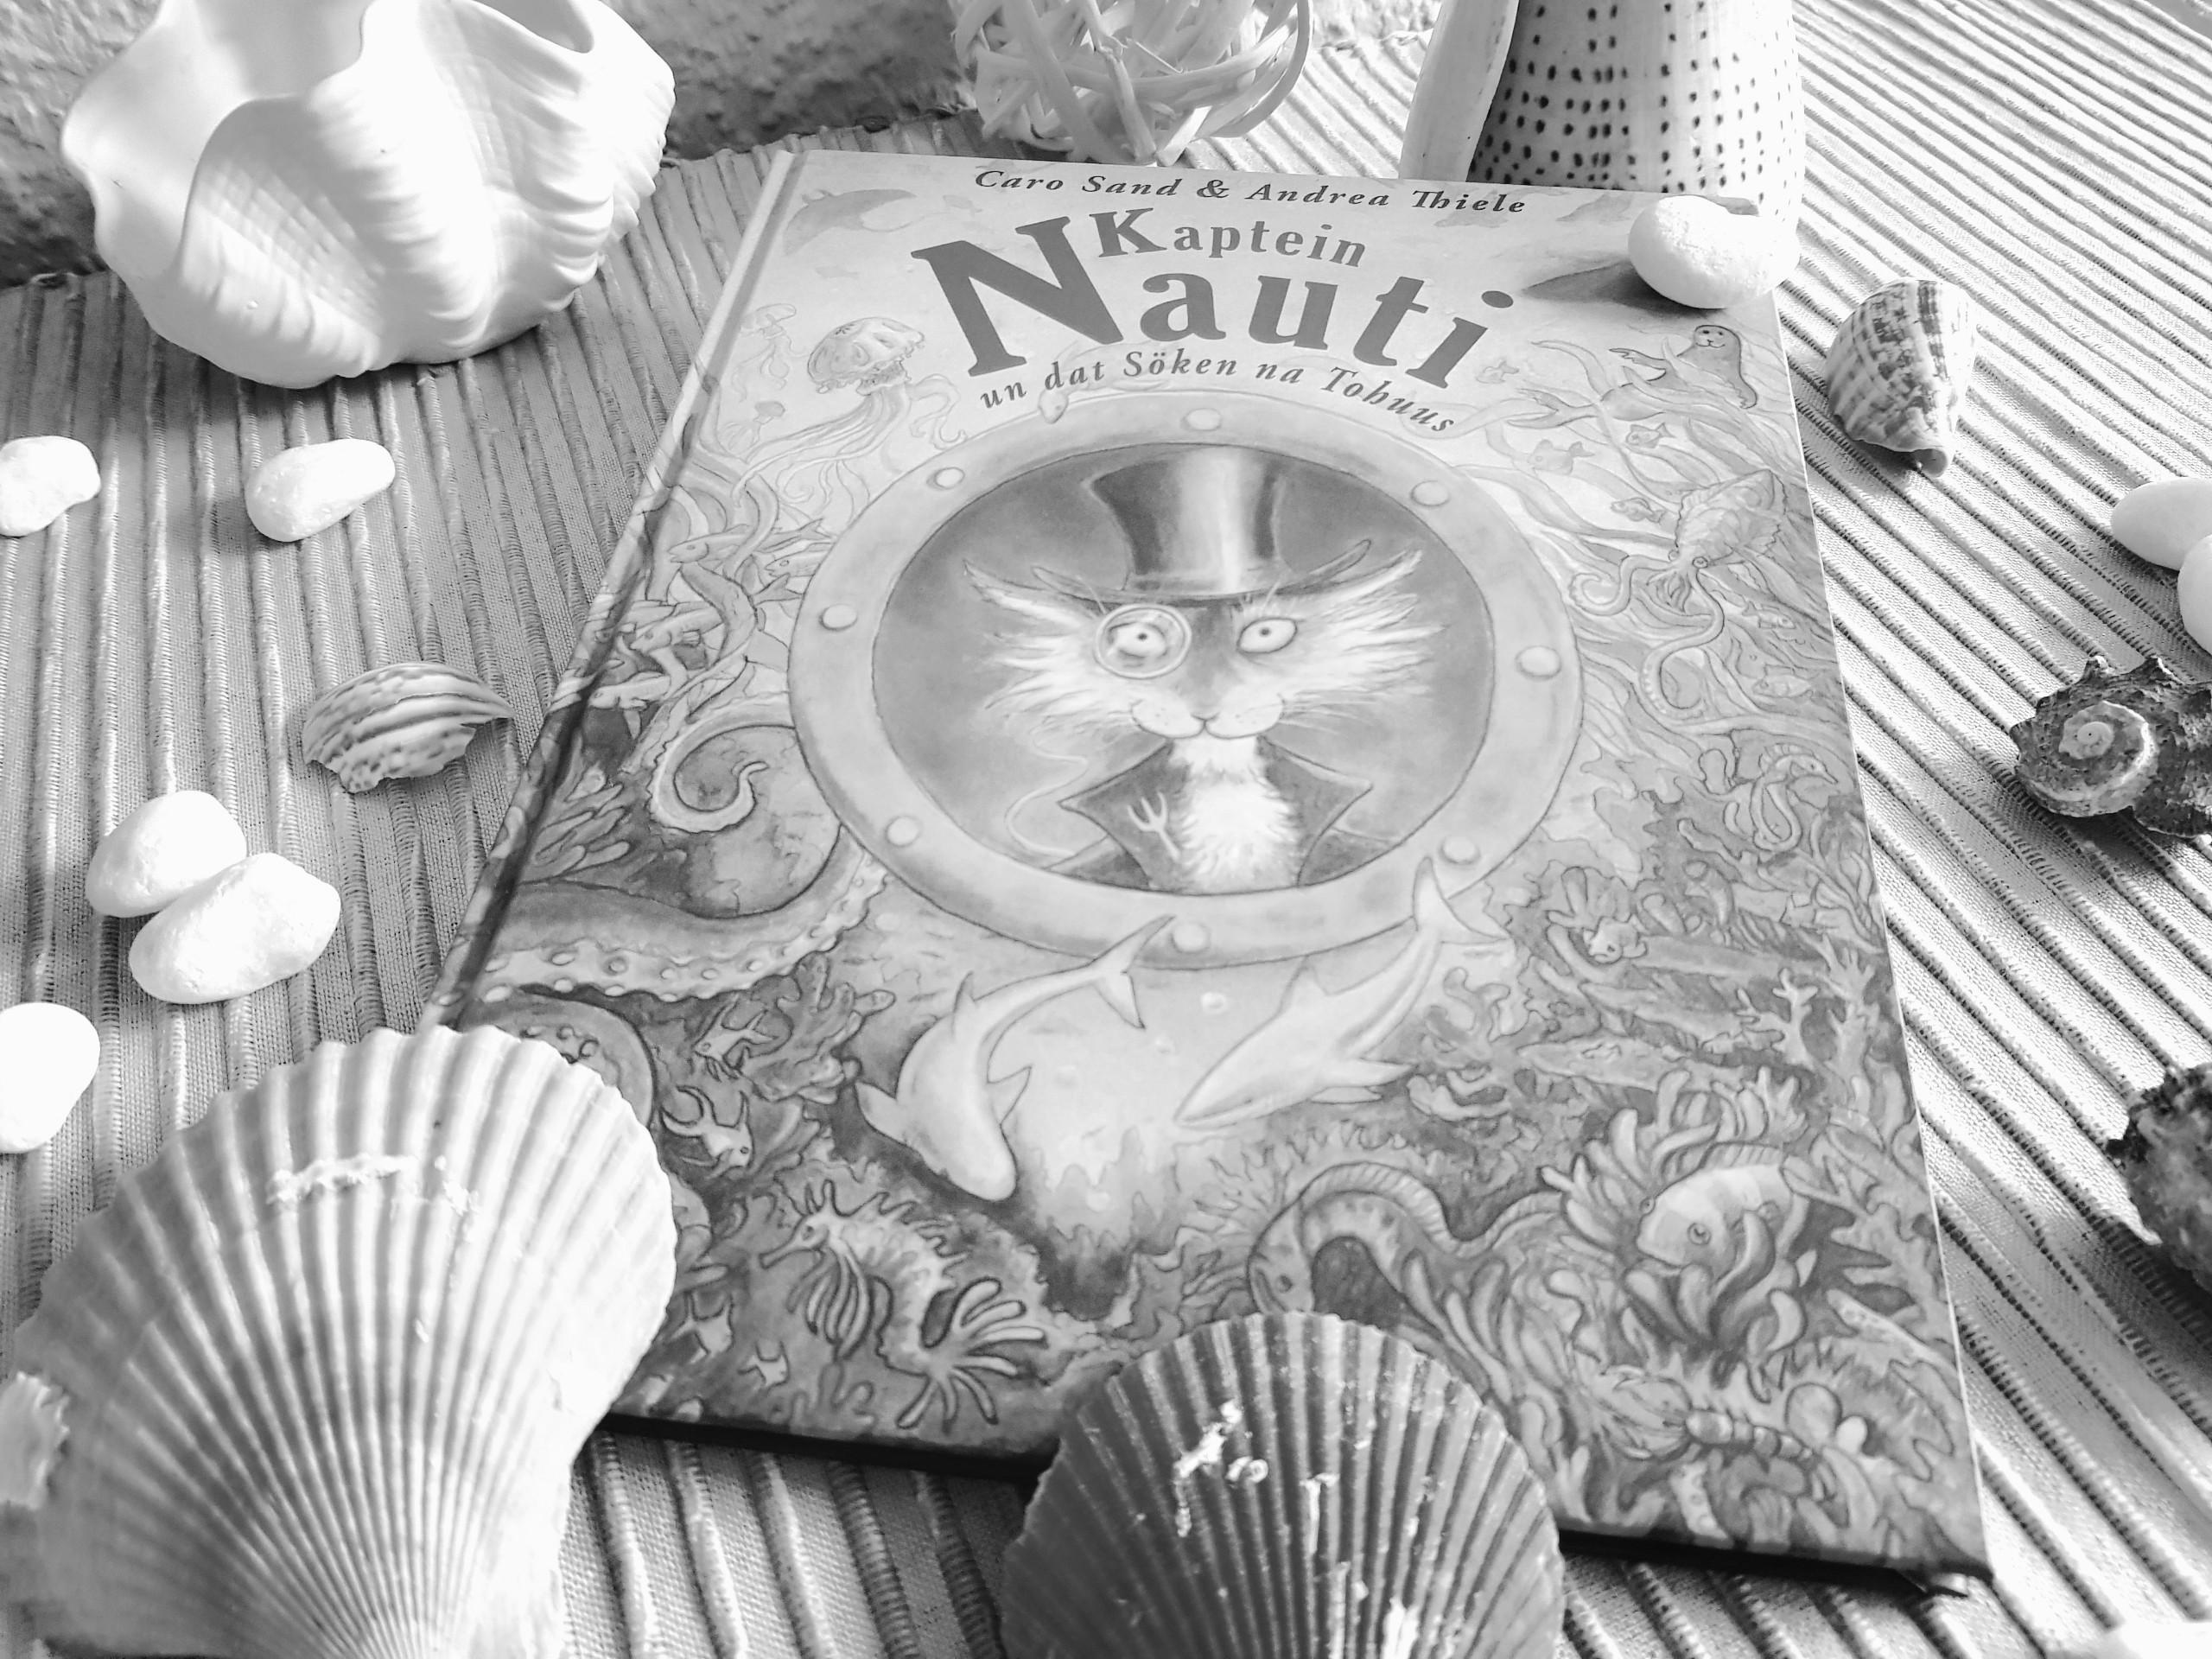 [Rezension] Caro Sand – Kaptein Nauti un dat Sölen na Tohuus